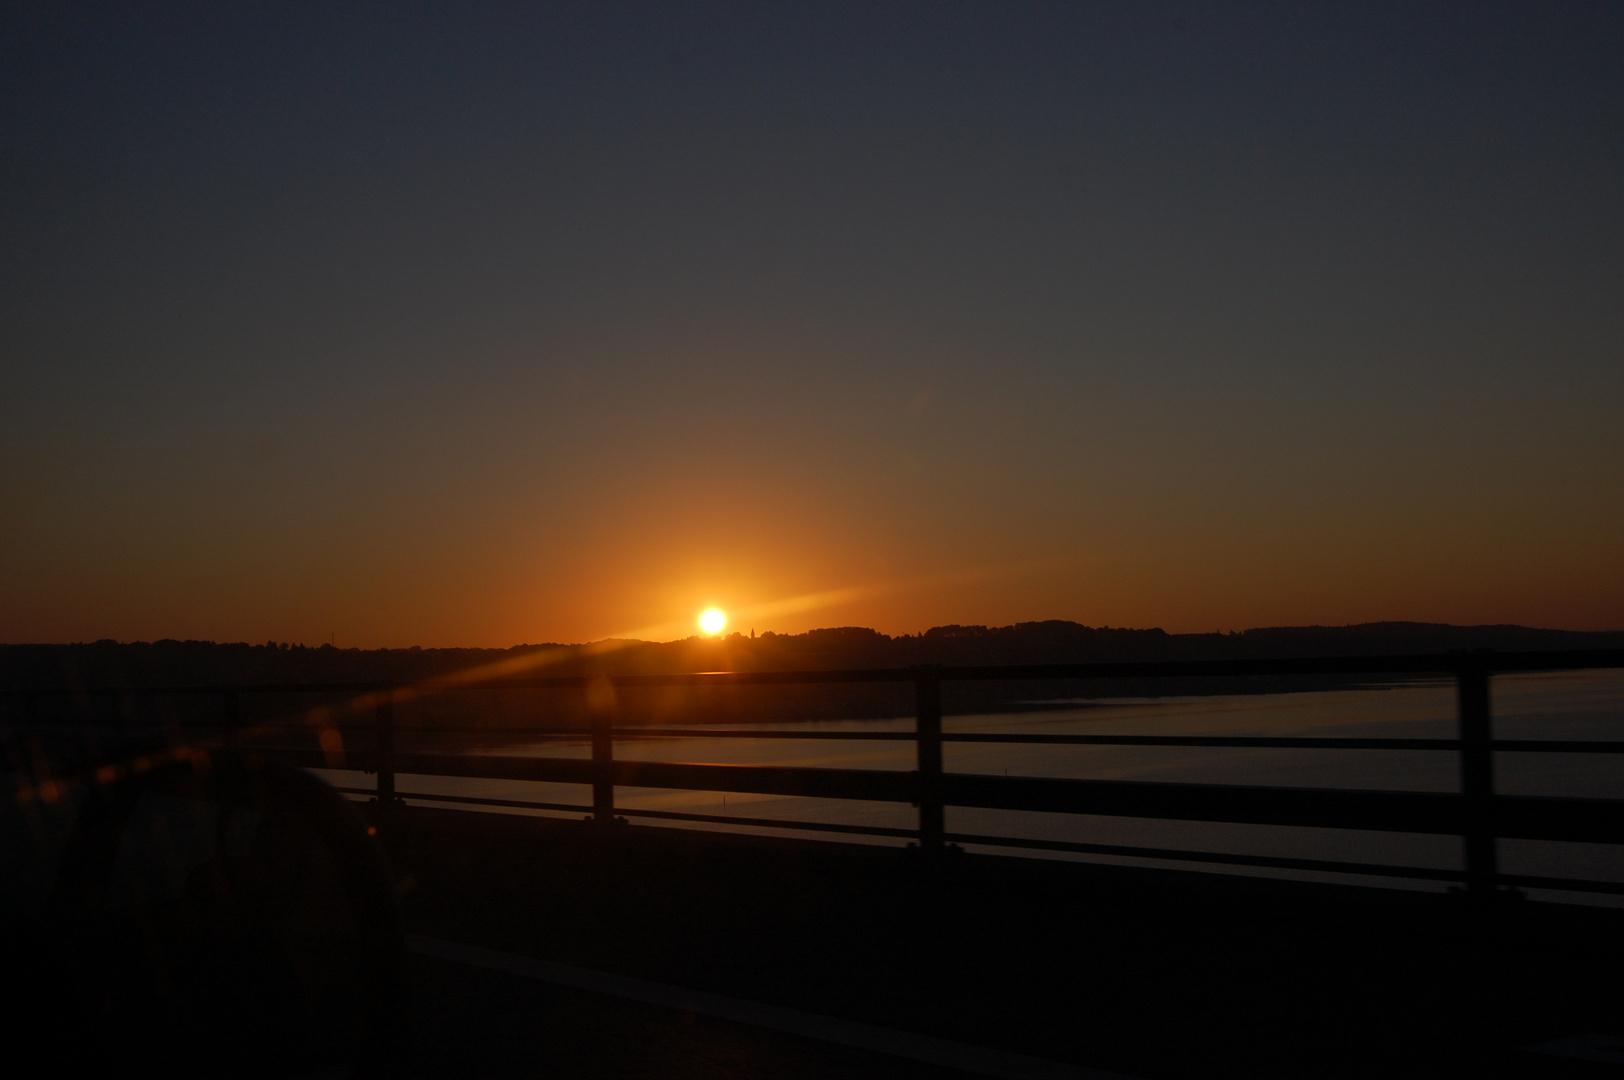 Sonnenuntergang im Juni bei Flensburg